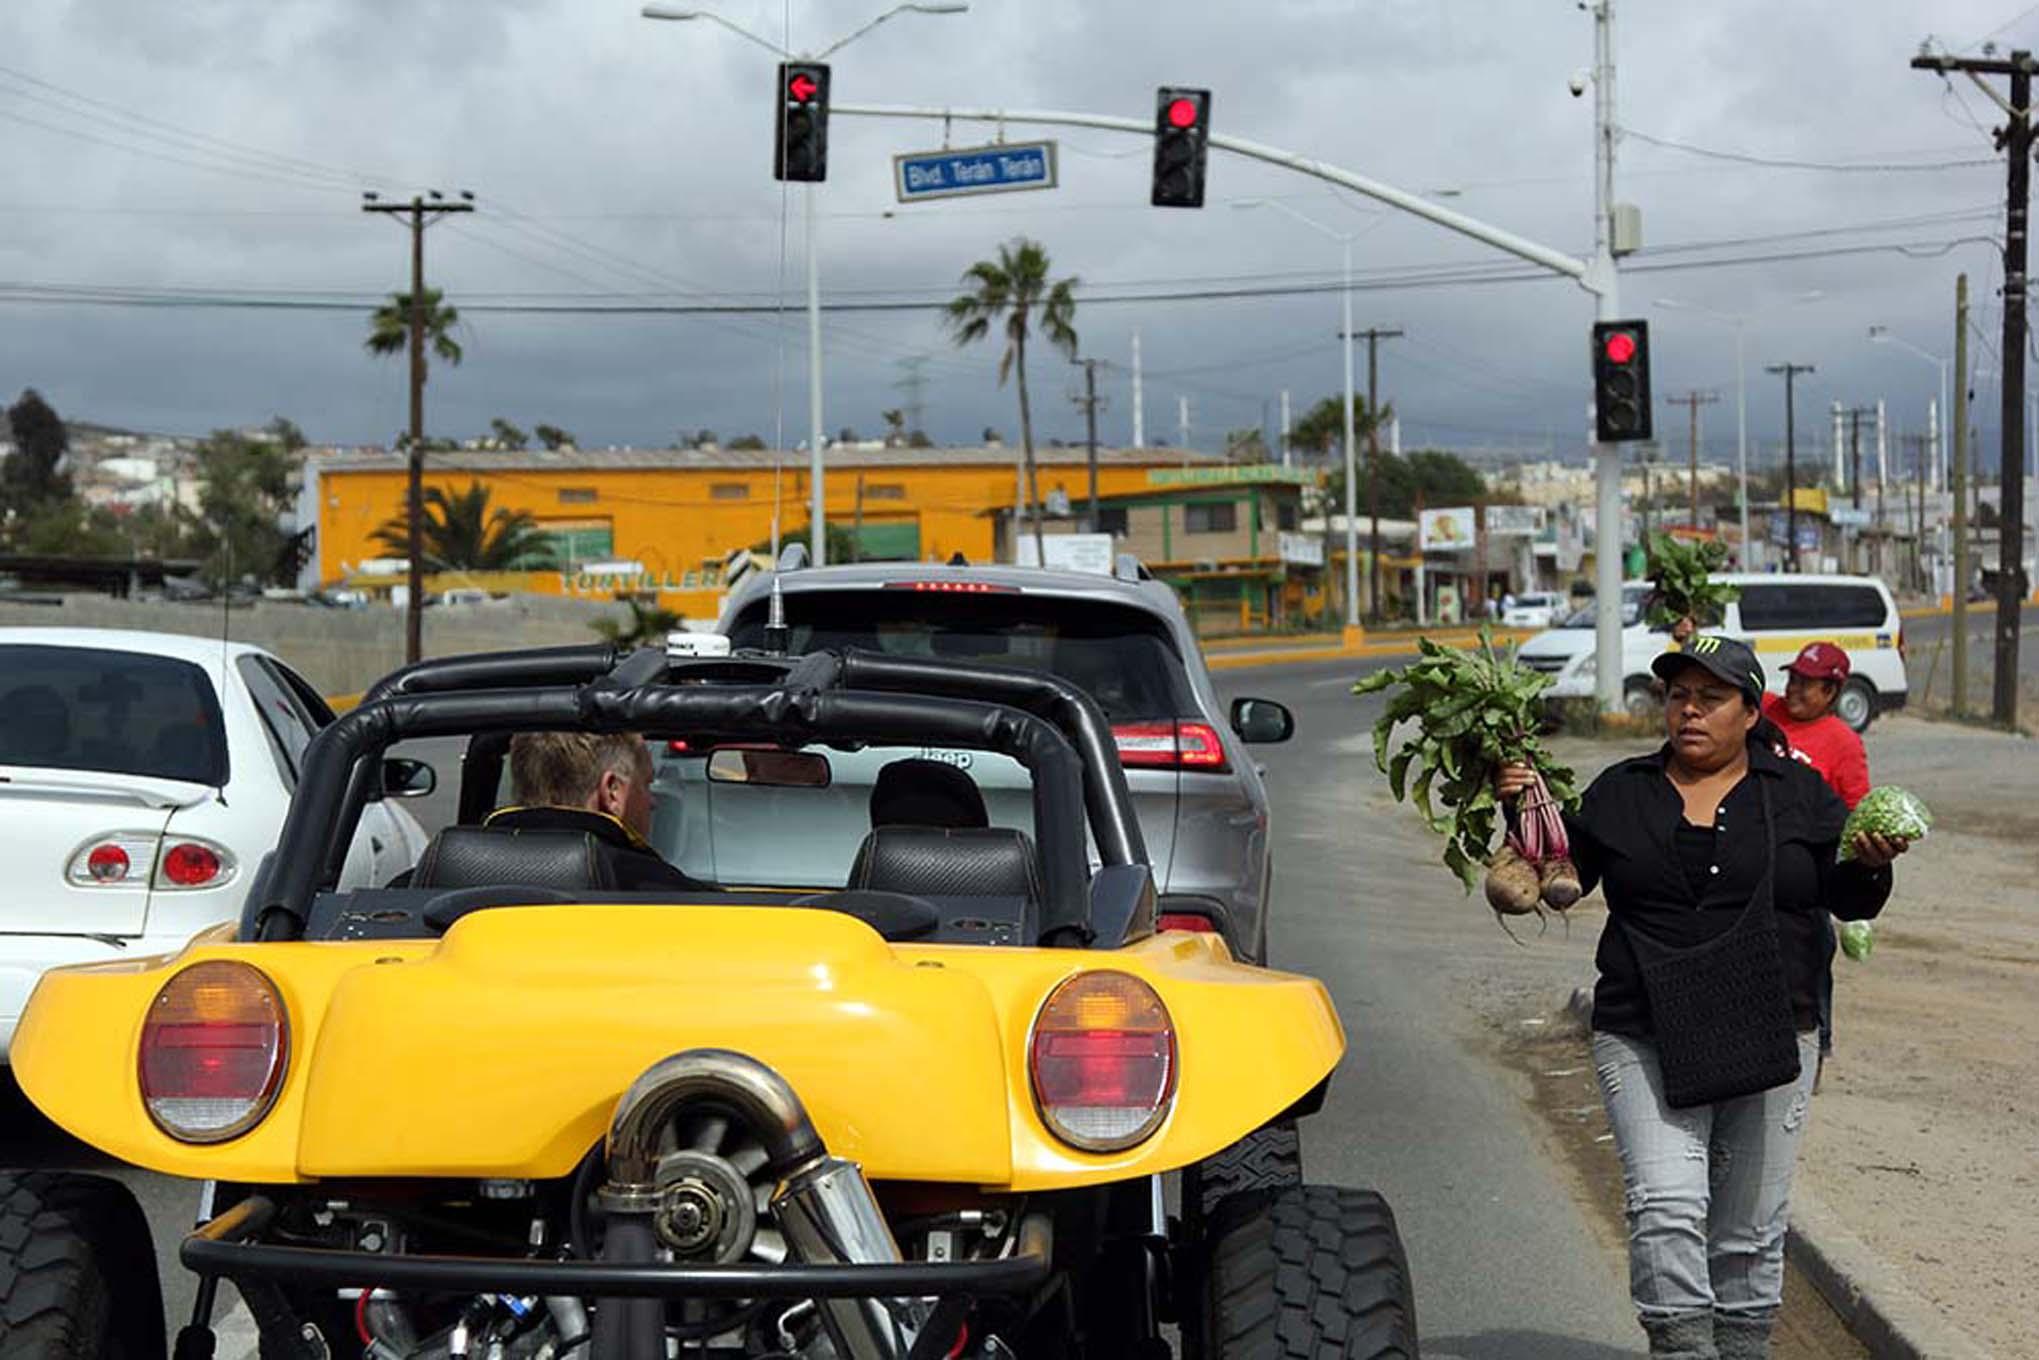 014NORRA Mexican 1000 BAJA offroad Race 2015 Manx Nova Chevy James Garner